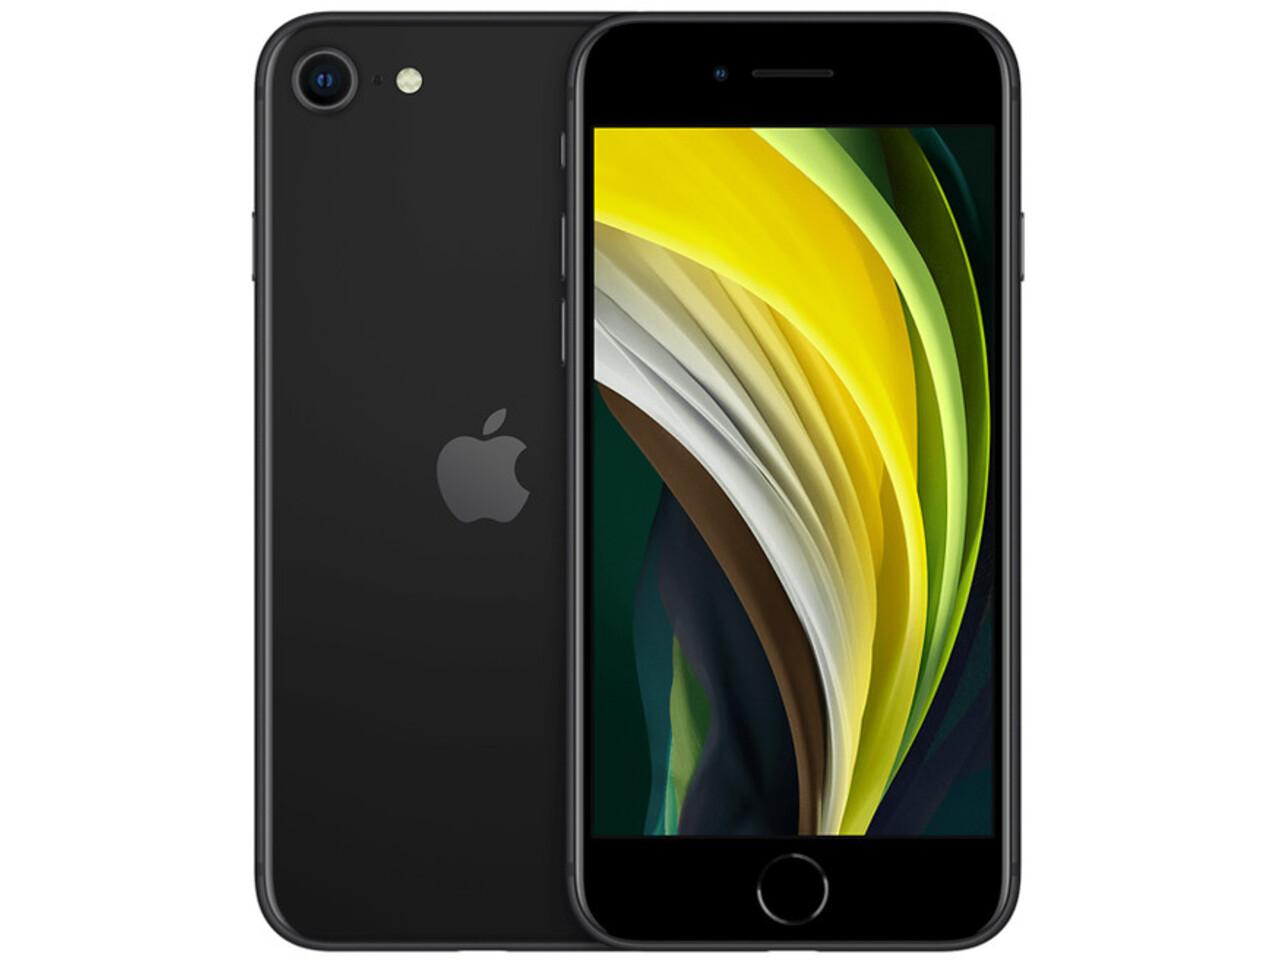 iphone se 2 black